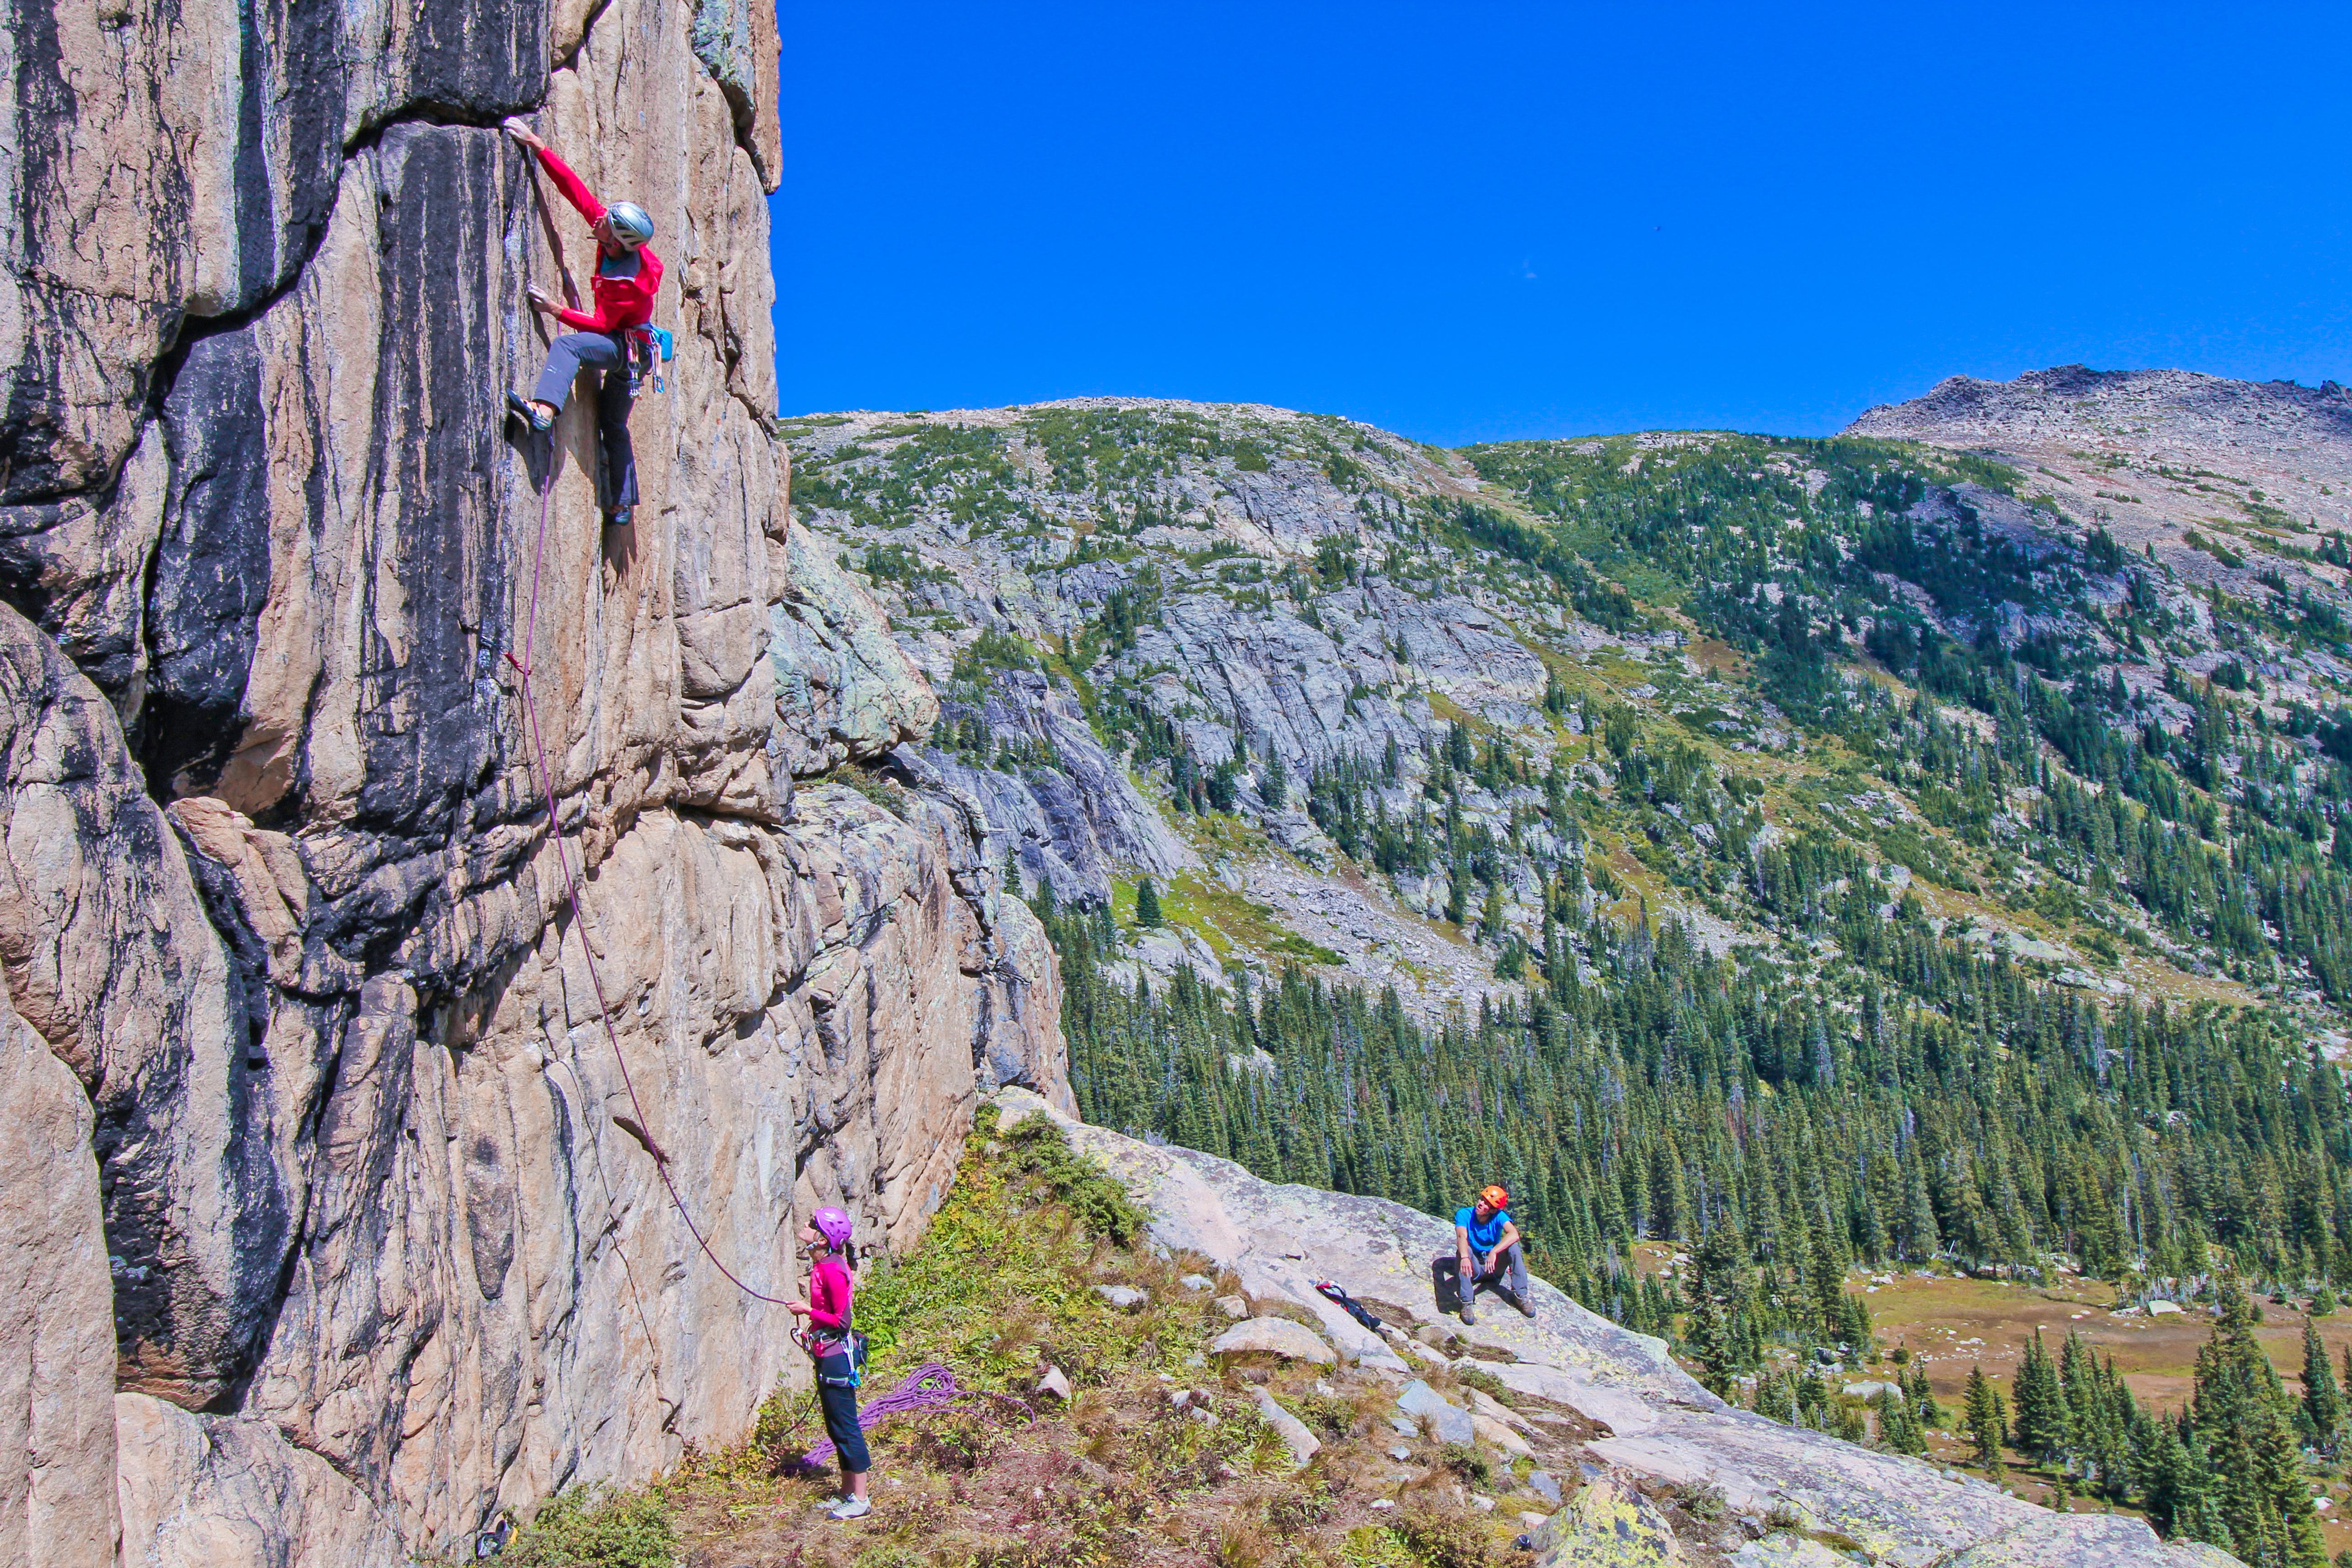 Gap Year Program - High Mountain Institute (HMI) Gap: Wilderness, Climbing & Conservation Semesters  4